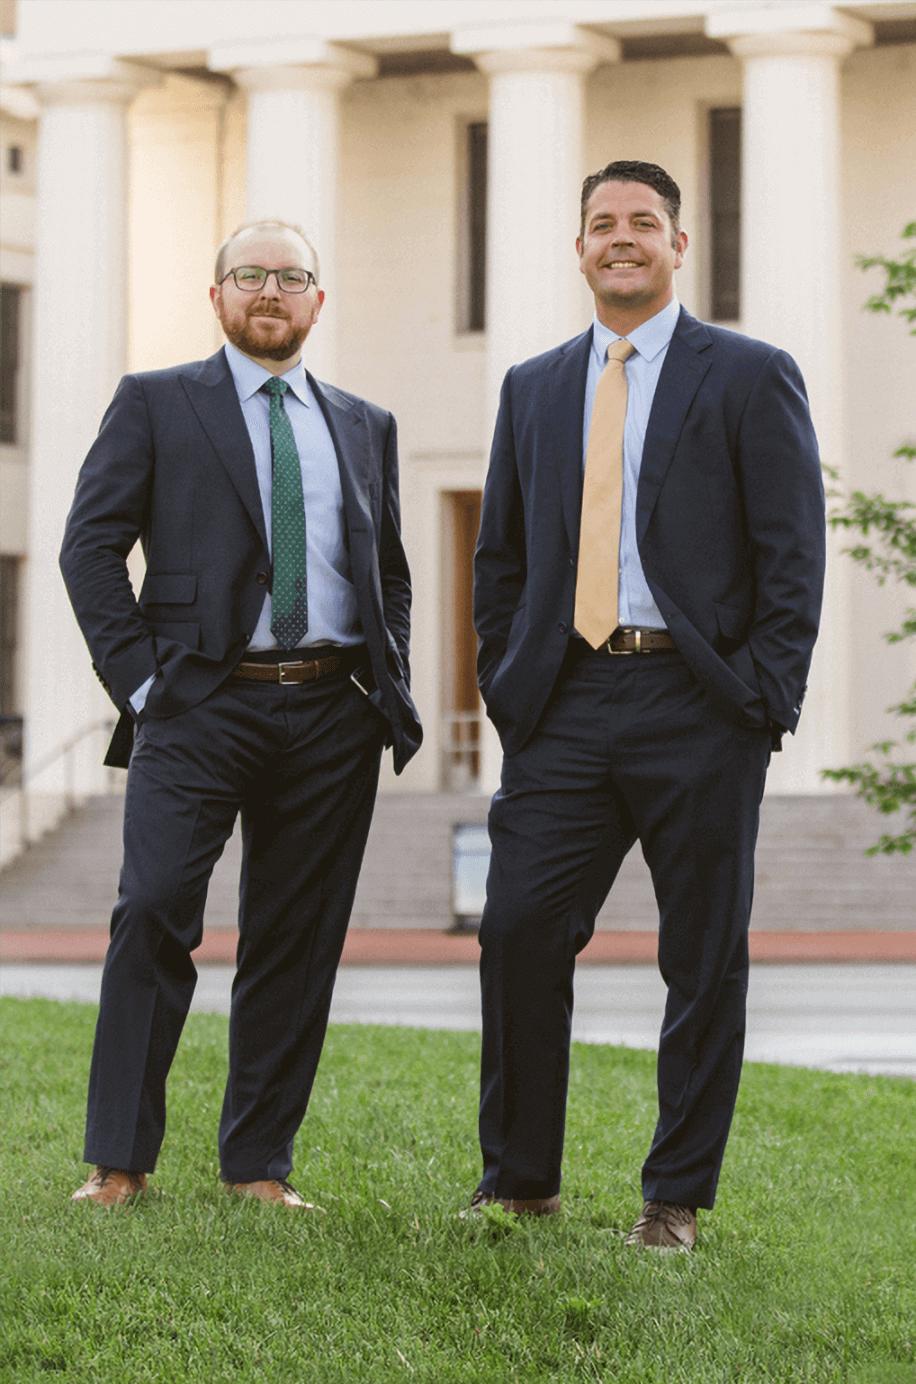 HM Attorneys